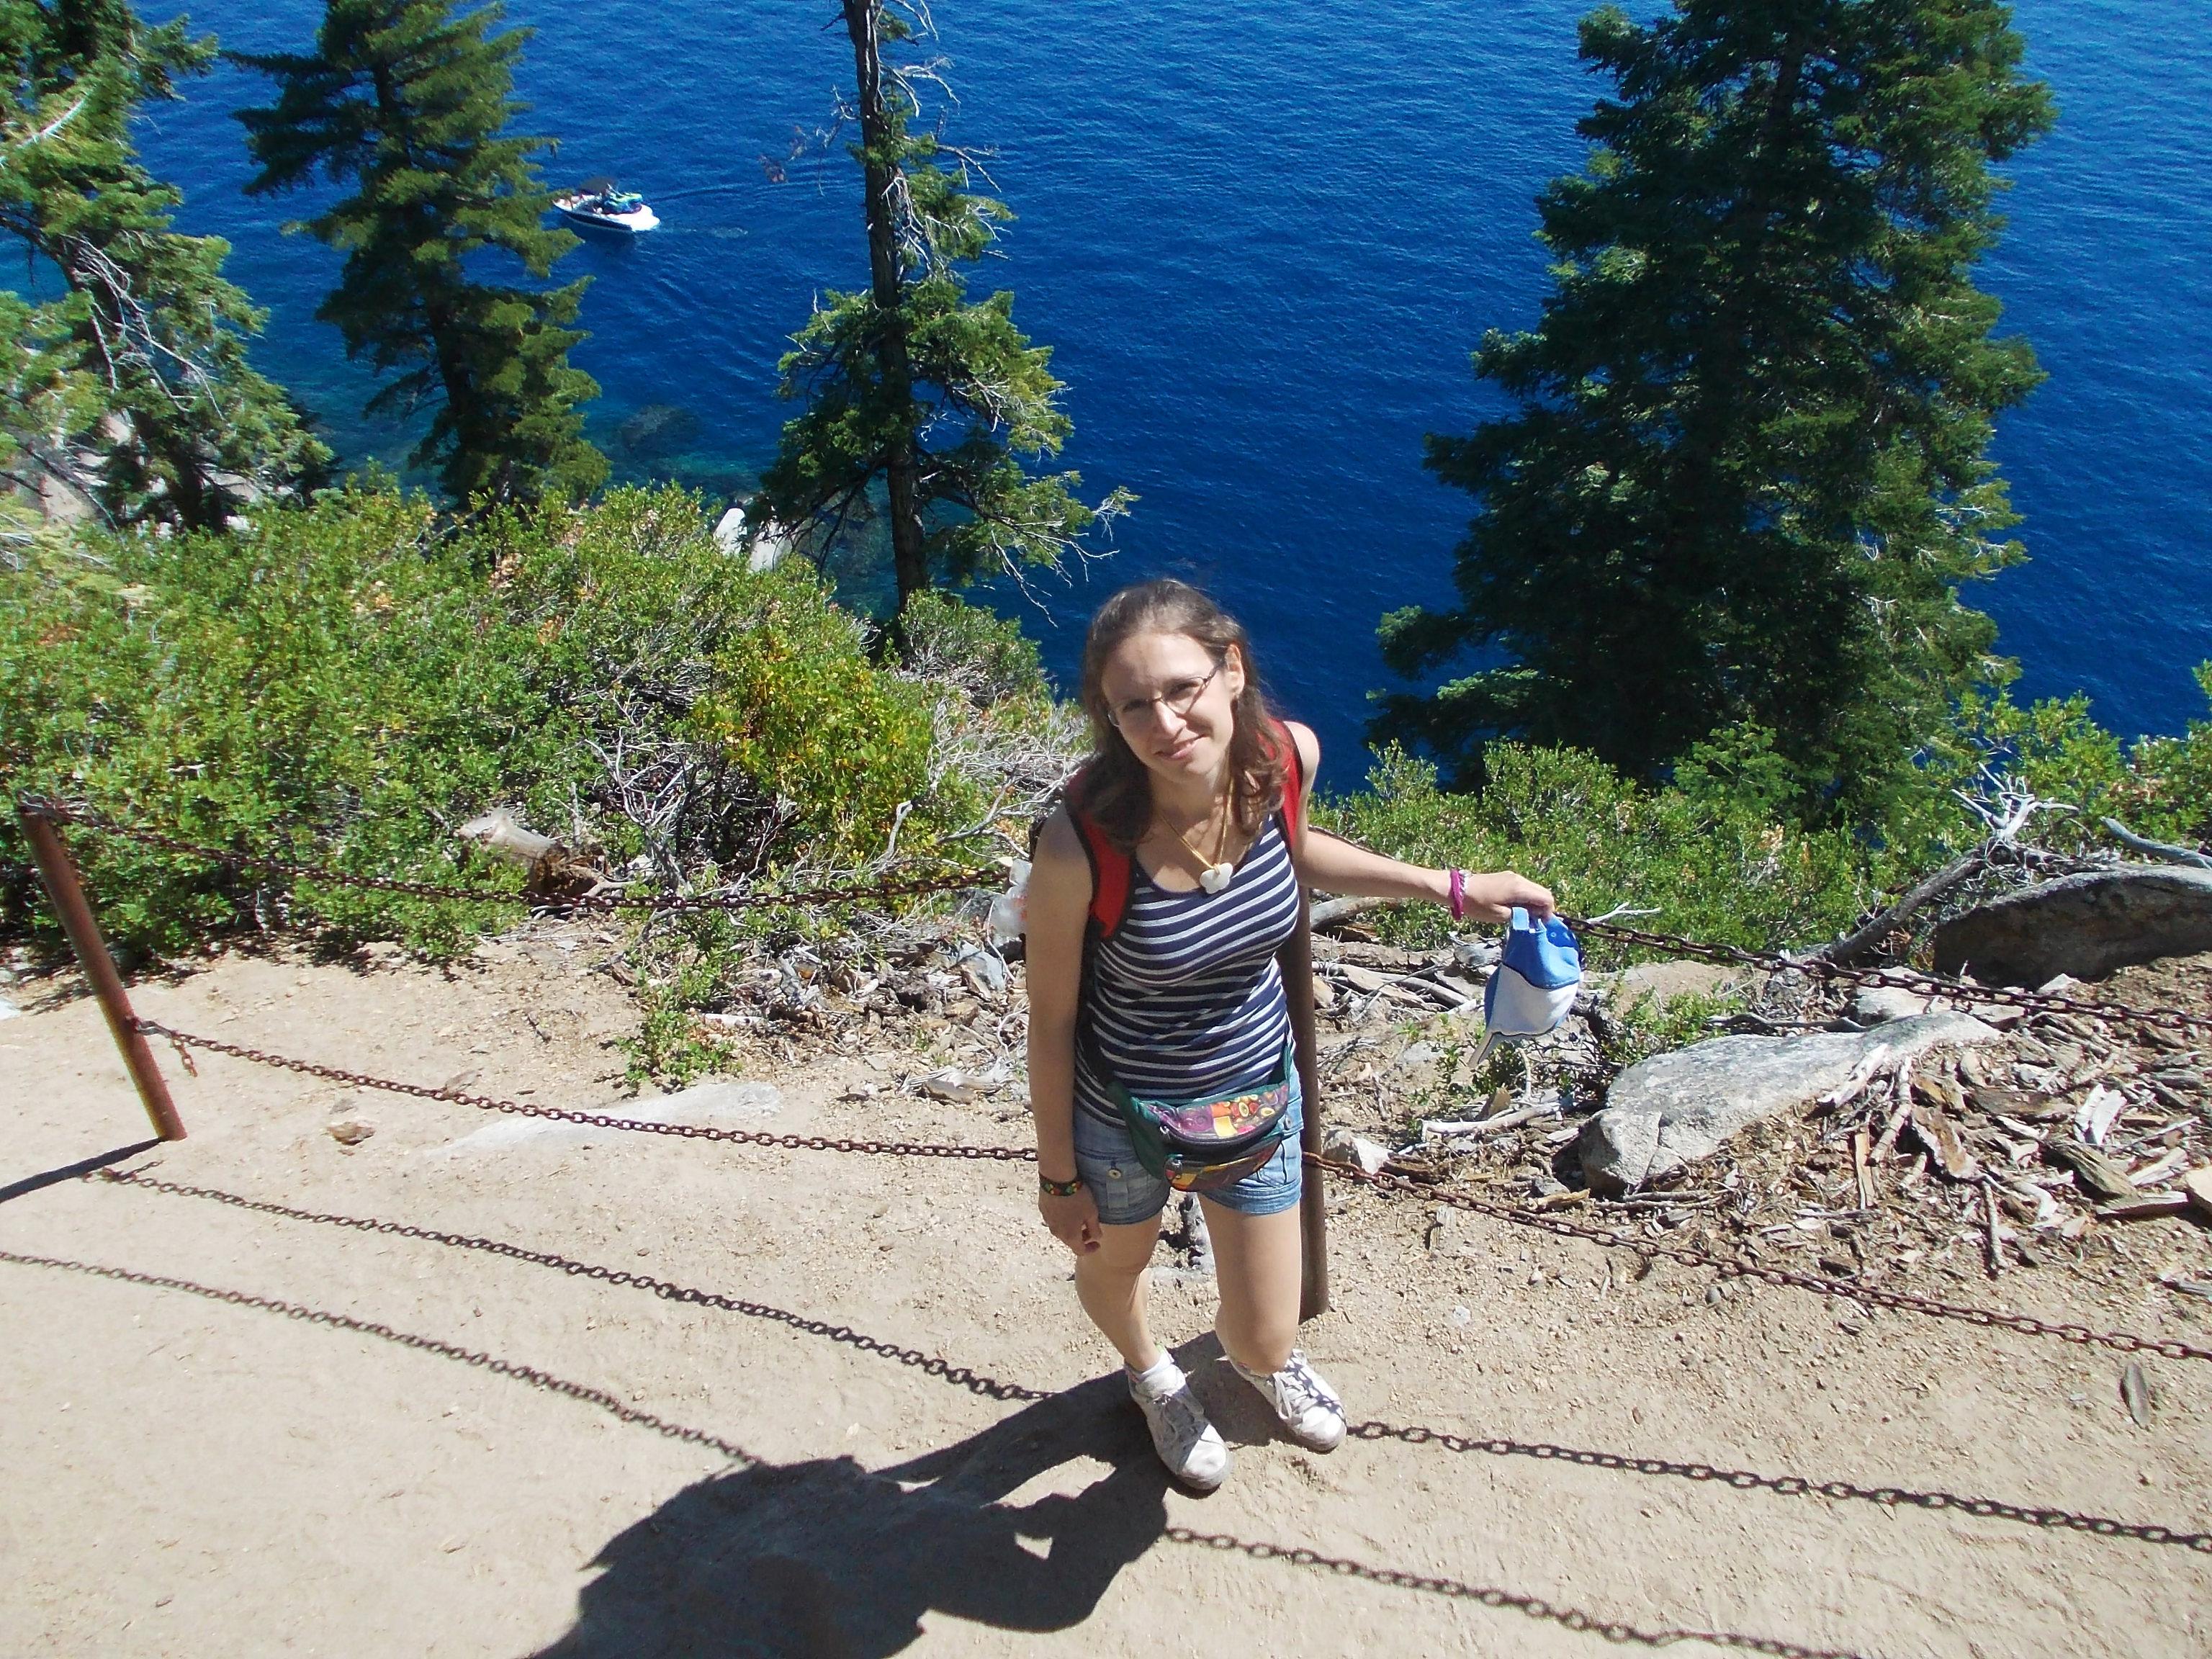 Rubicon Trail, Lake Tahoe, California, USA